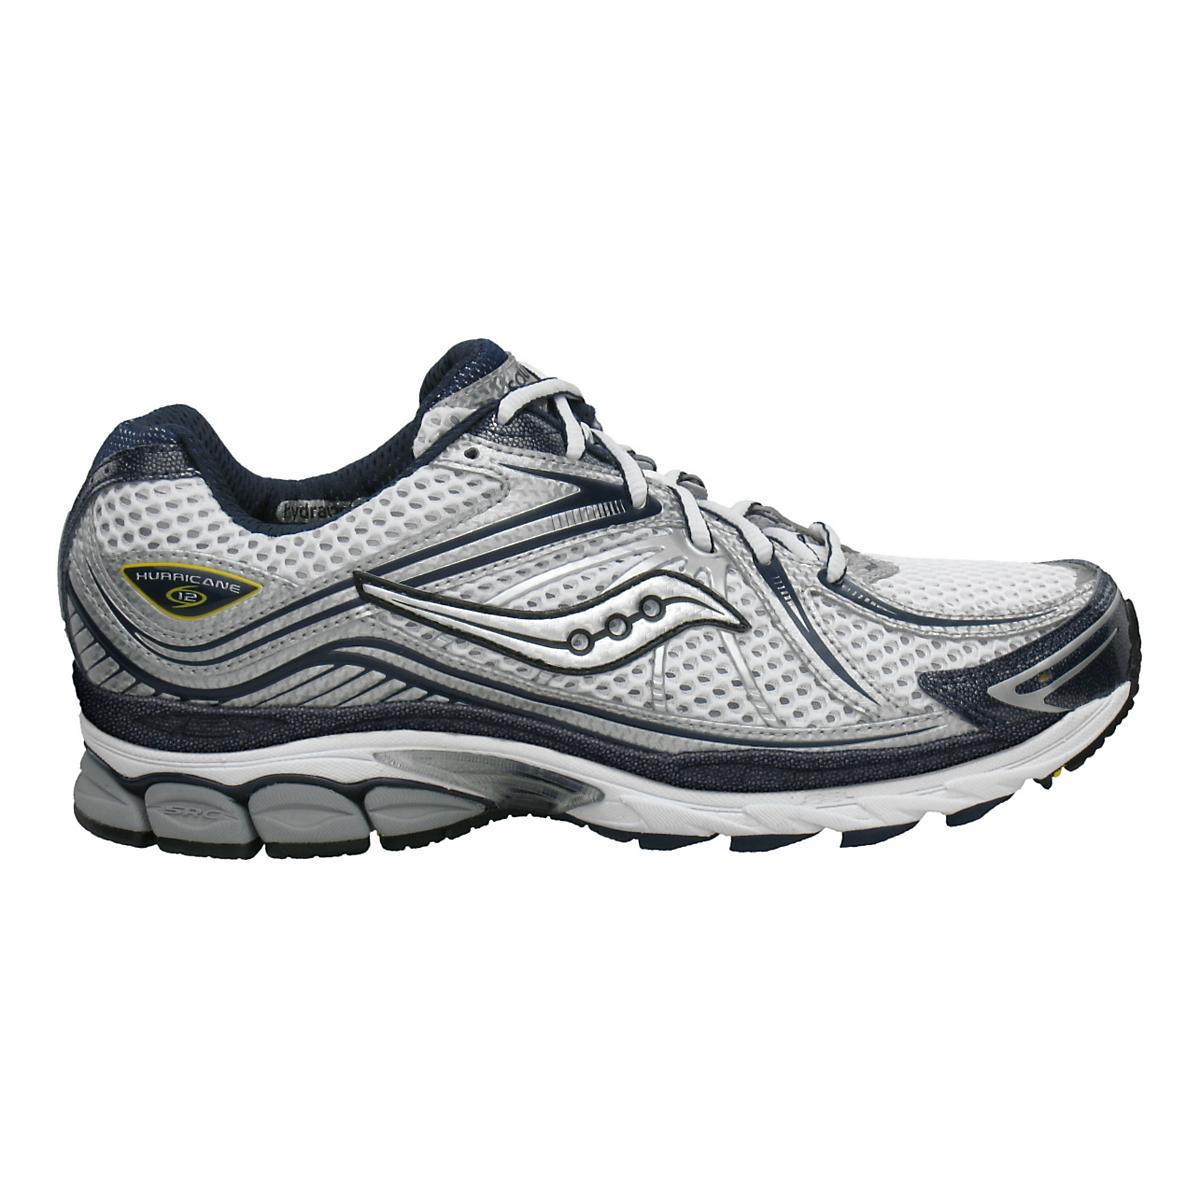 065b3287 Mens Saucony ProGrid Hurricane 12 Running Shoe at Road Runner Sports